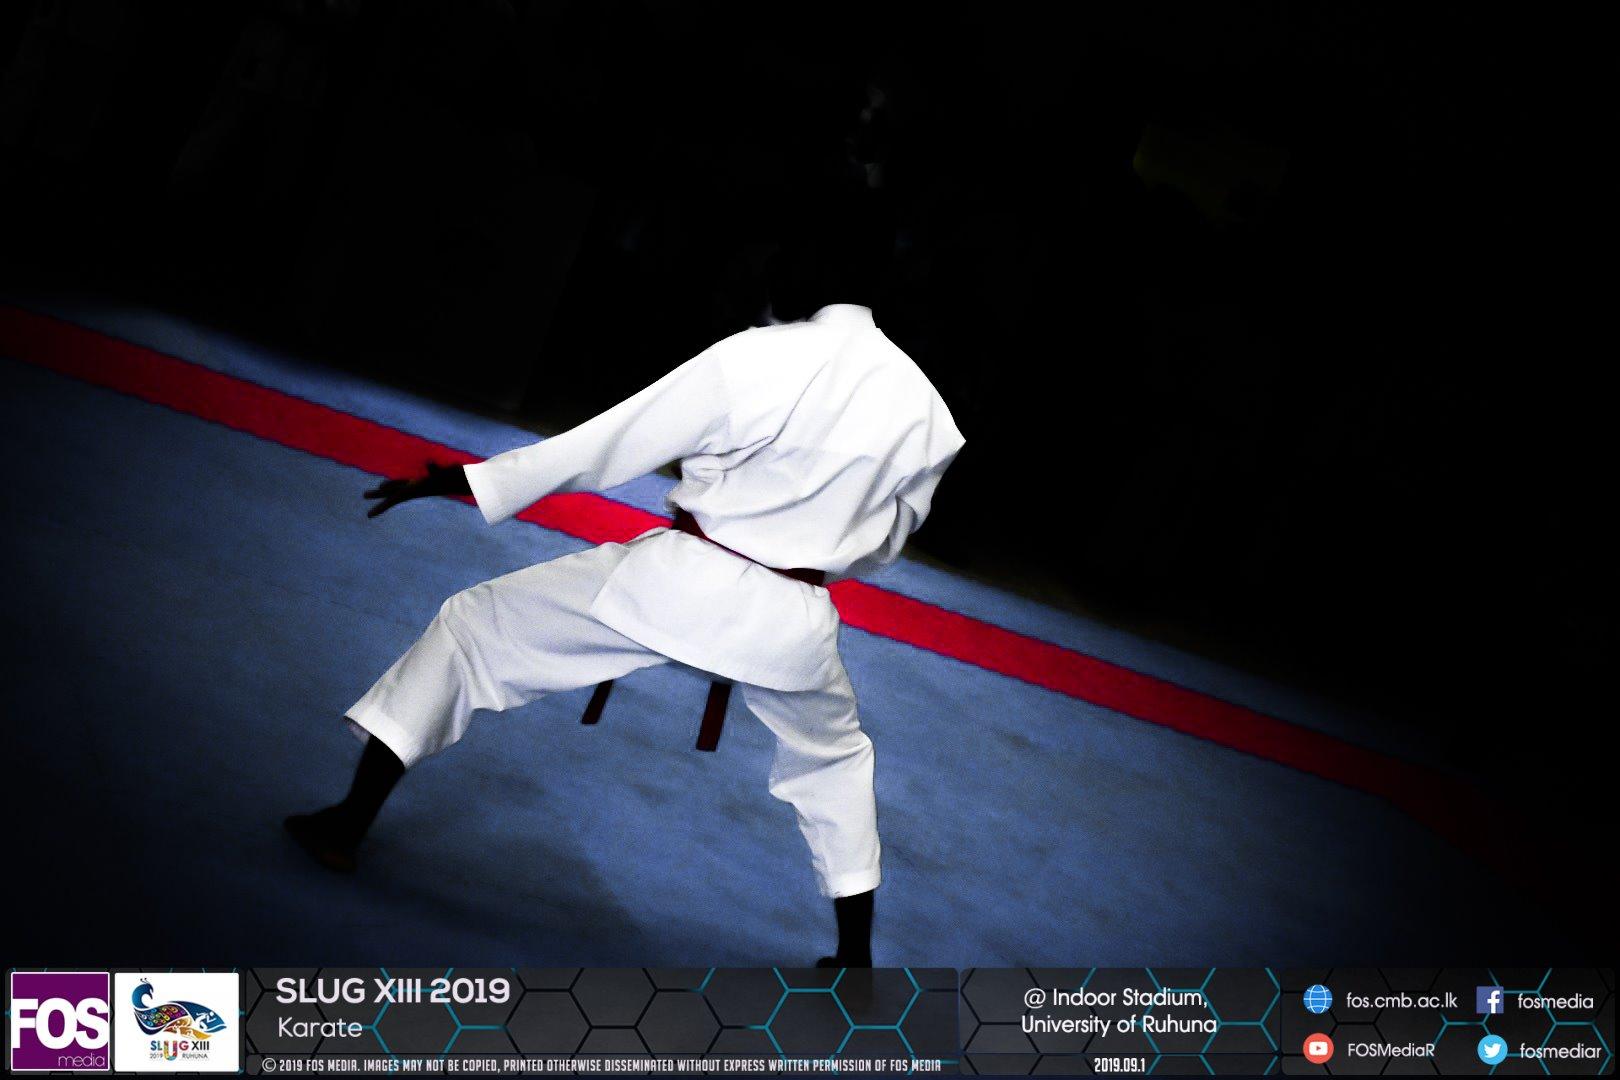 Karate Tournament – SLUG XIII 2019